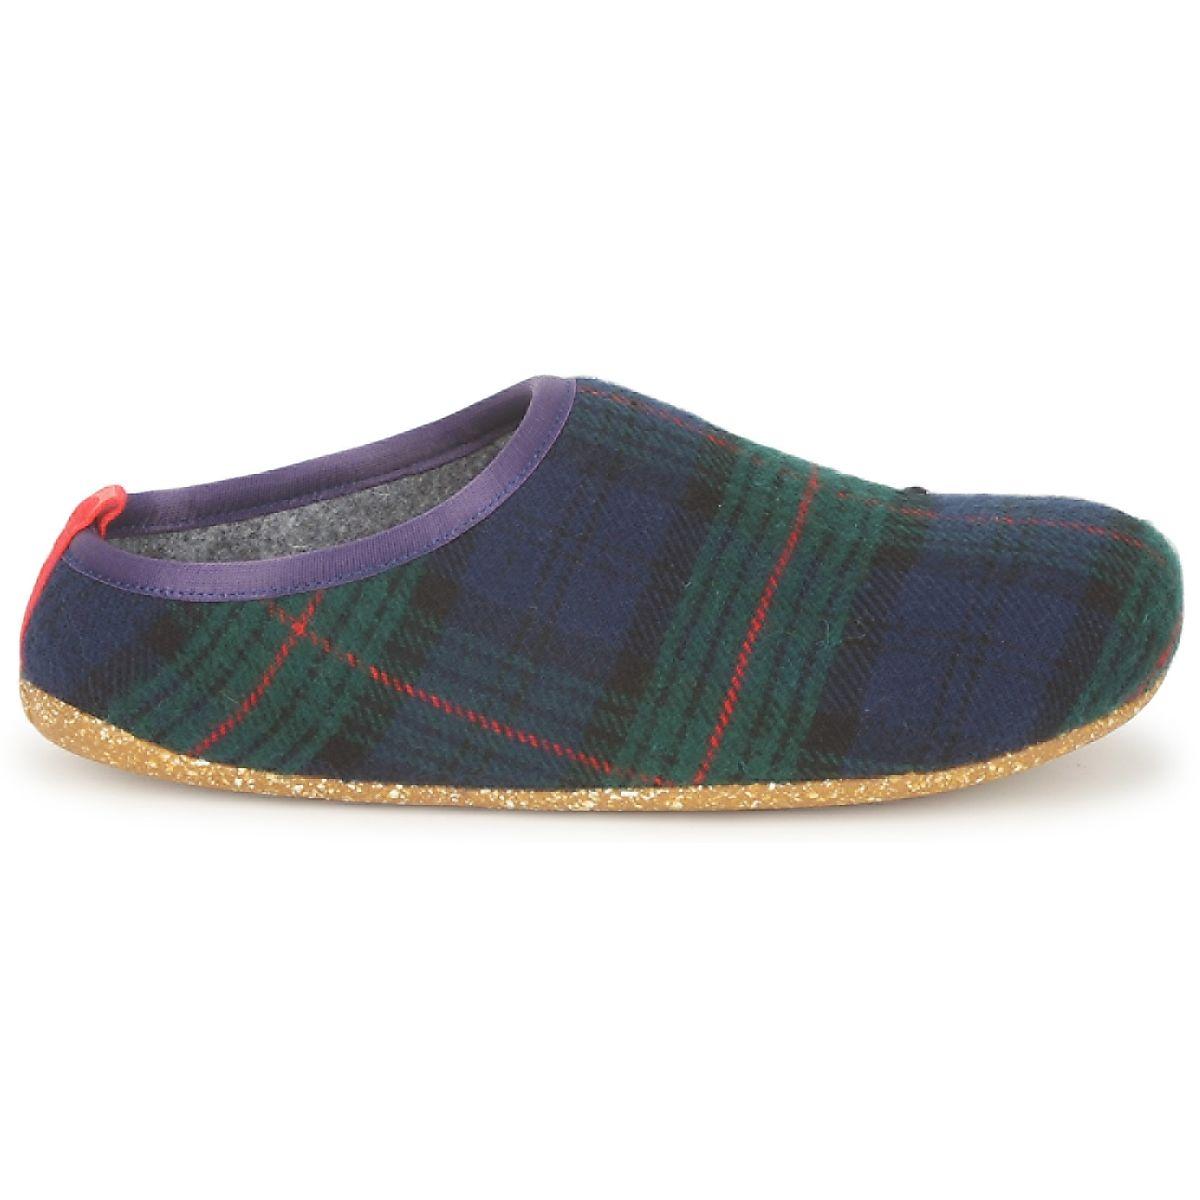 Zapatos azul marino Camper Wabi para hombre xblkZPB